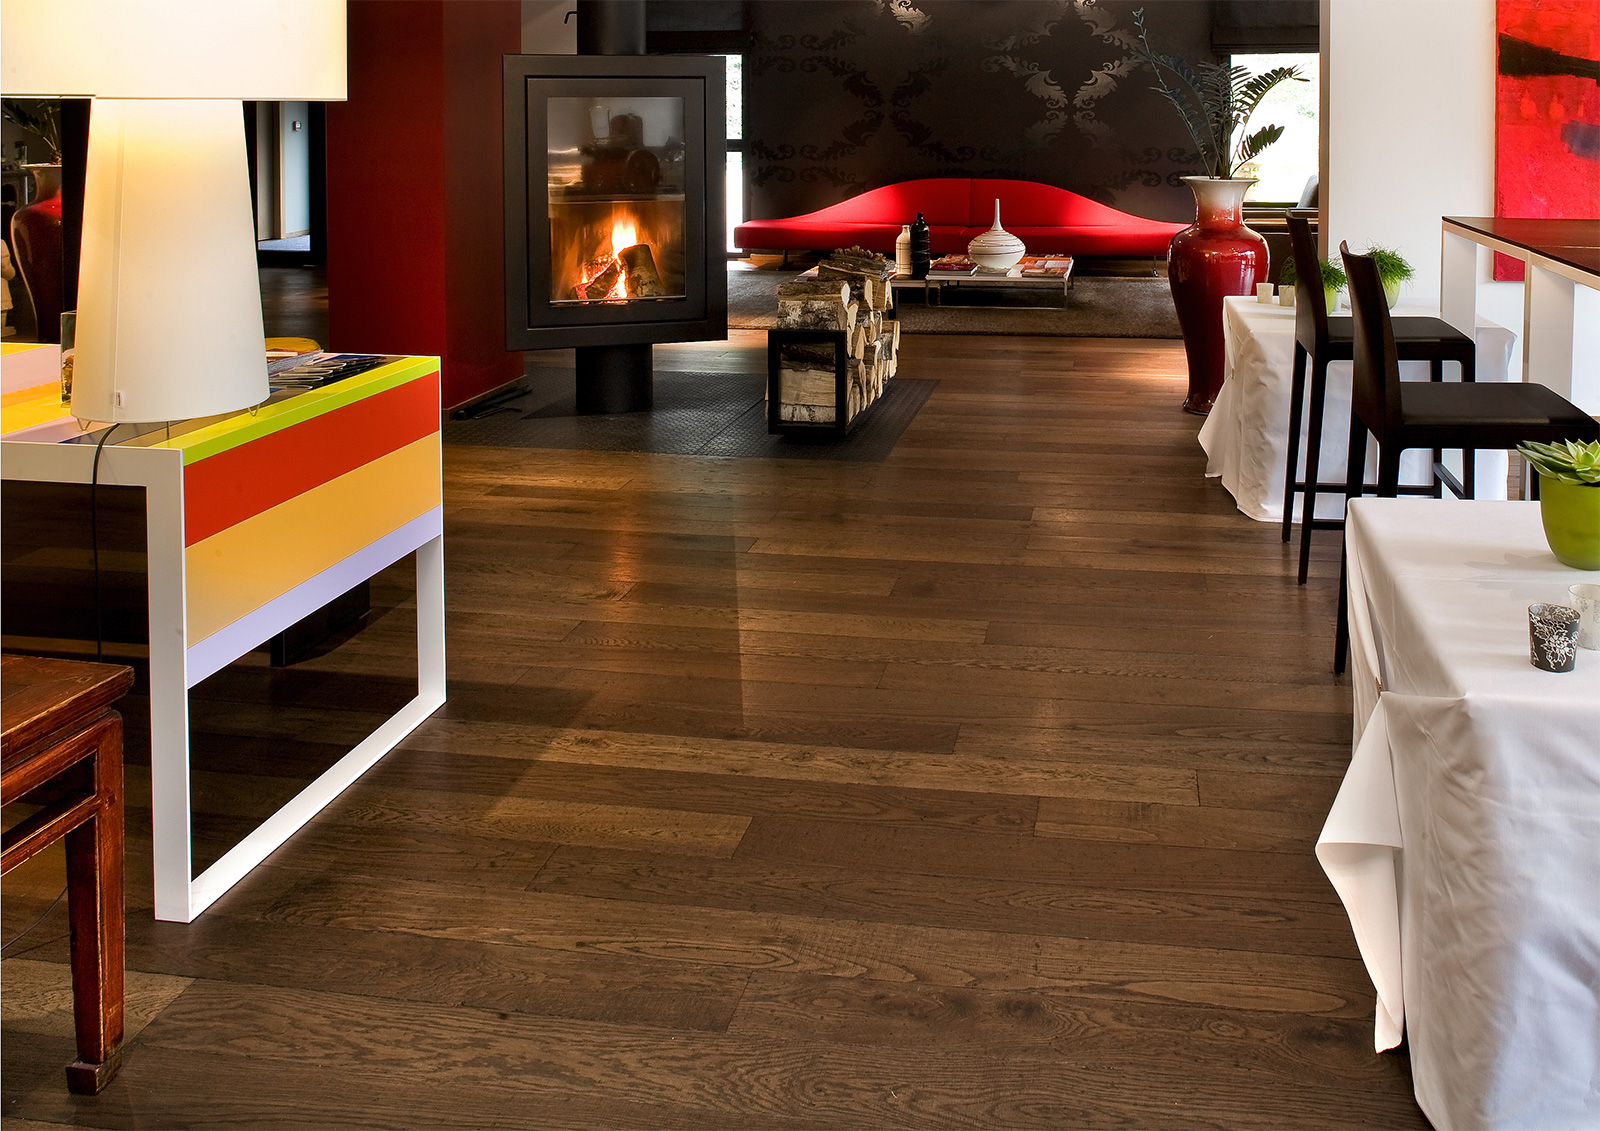 magasin de parquet simple parquet pin maritime yvelines with magasin de parquet affordable top. Black Bedroom Furniture Sets. Home Design Ideas